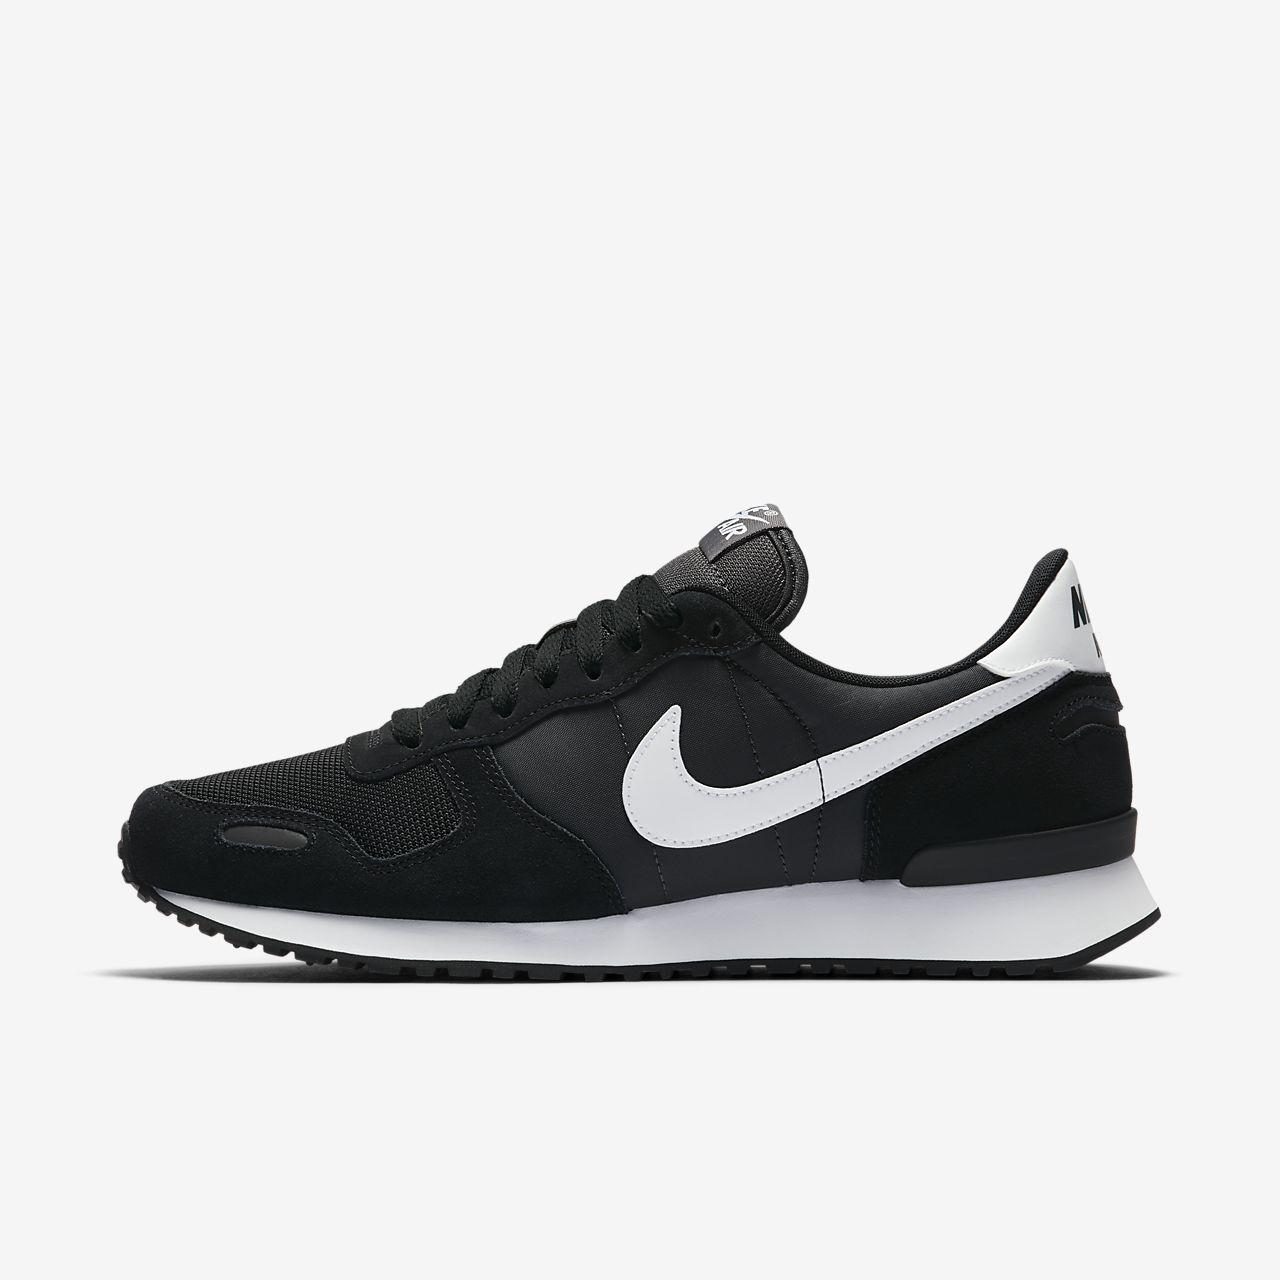 8495f5ea45b55 Sapatilhas Nike Air Vortex para homem. Nike.com PT